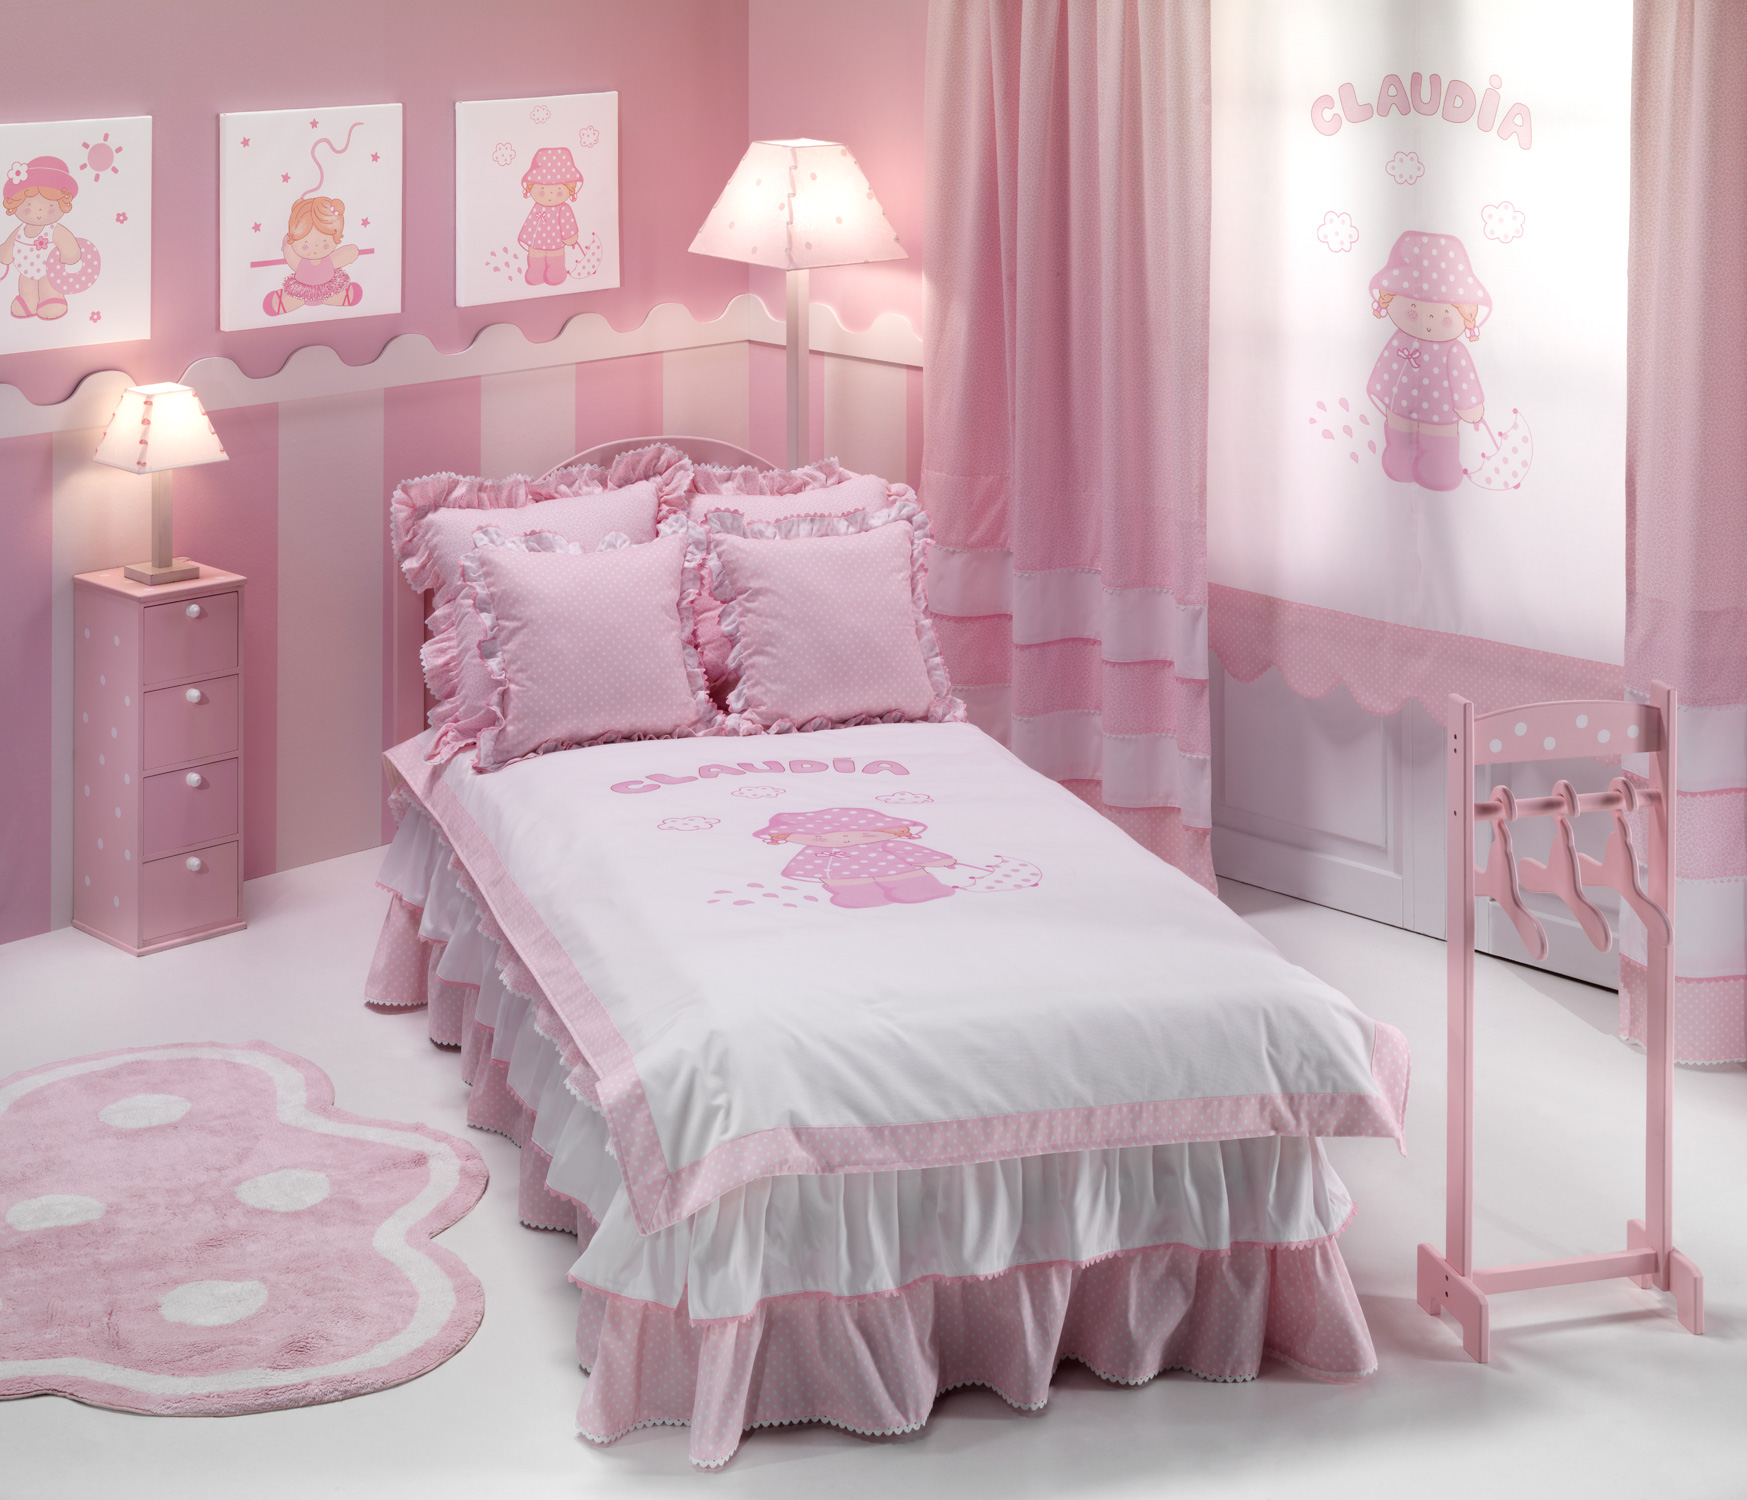 Telas para ni as en zaragoza colecci n coquettas for Modelo de tapiceria para dormitorio adulto